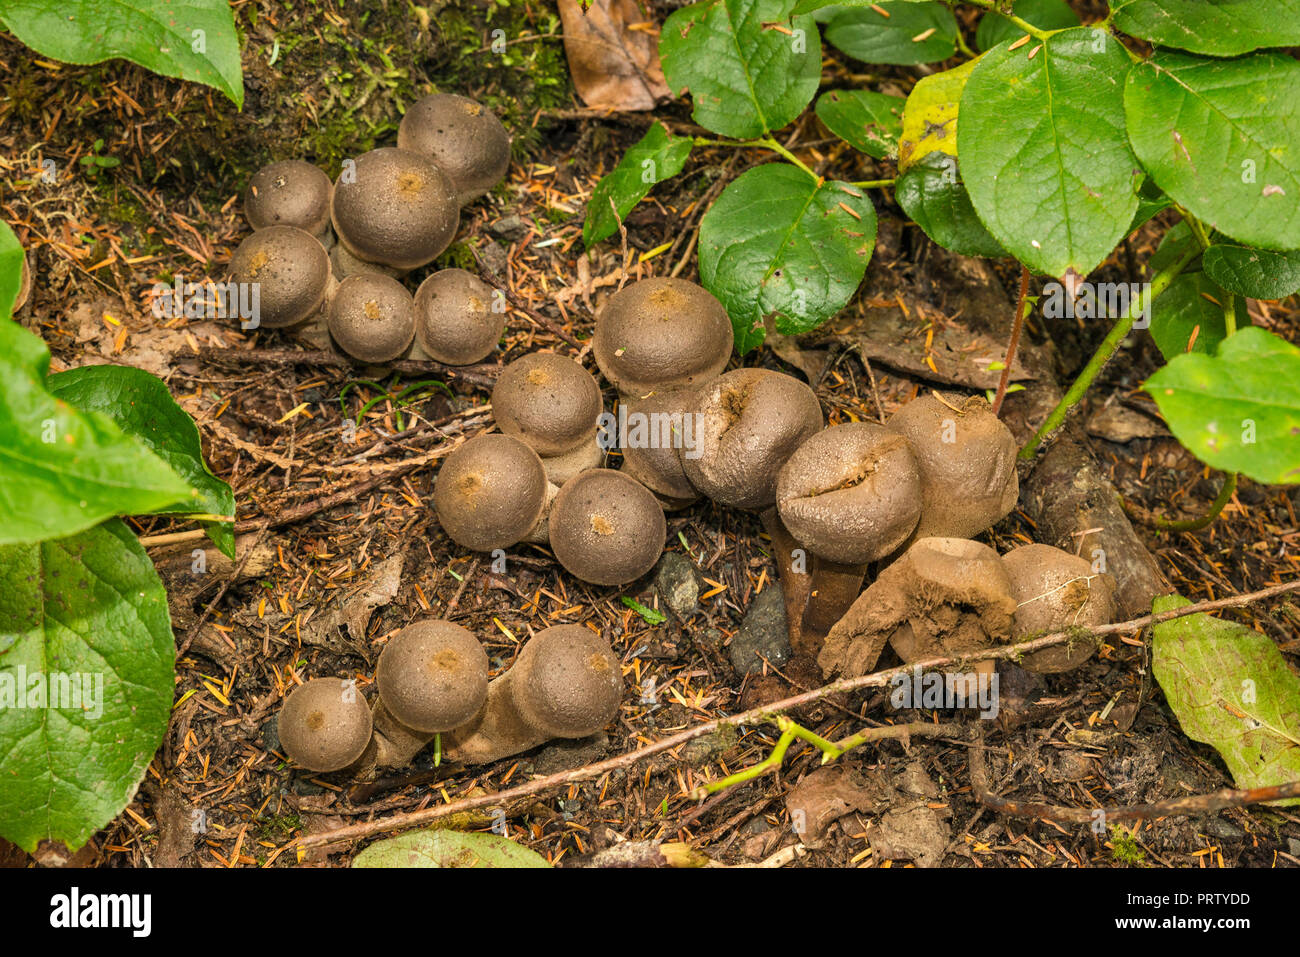 Honey mushrooms, Cape Alava Trail, temperate rain forest, near Cape Alava, Pacific Coast, Olympic National Park, Washington state, USA - Stock Image